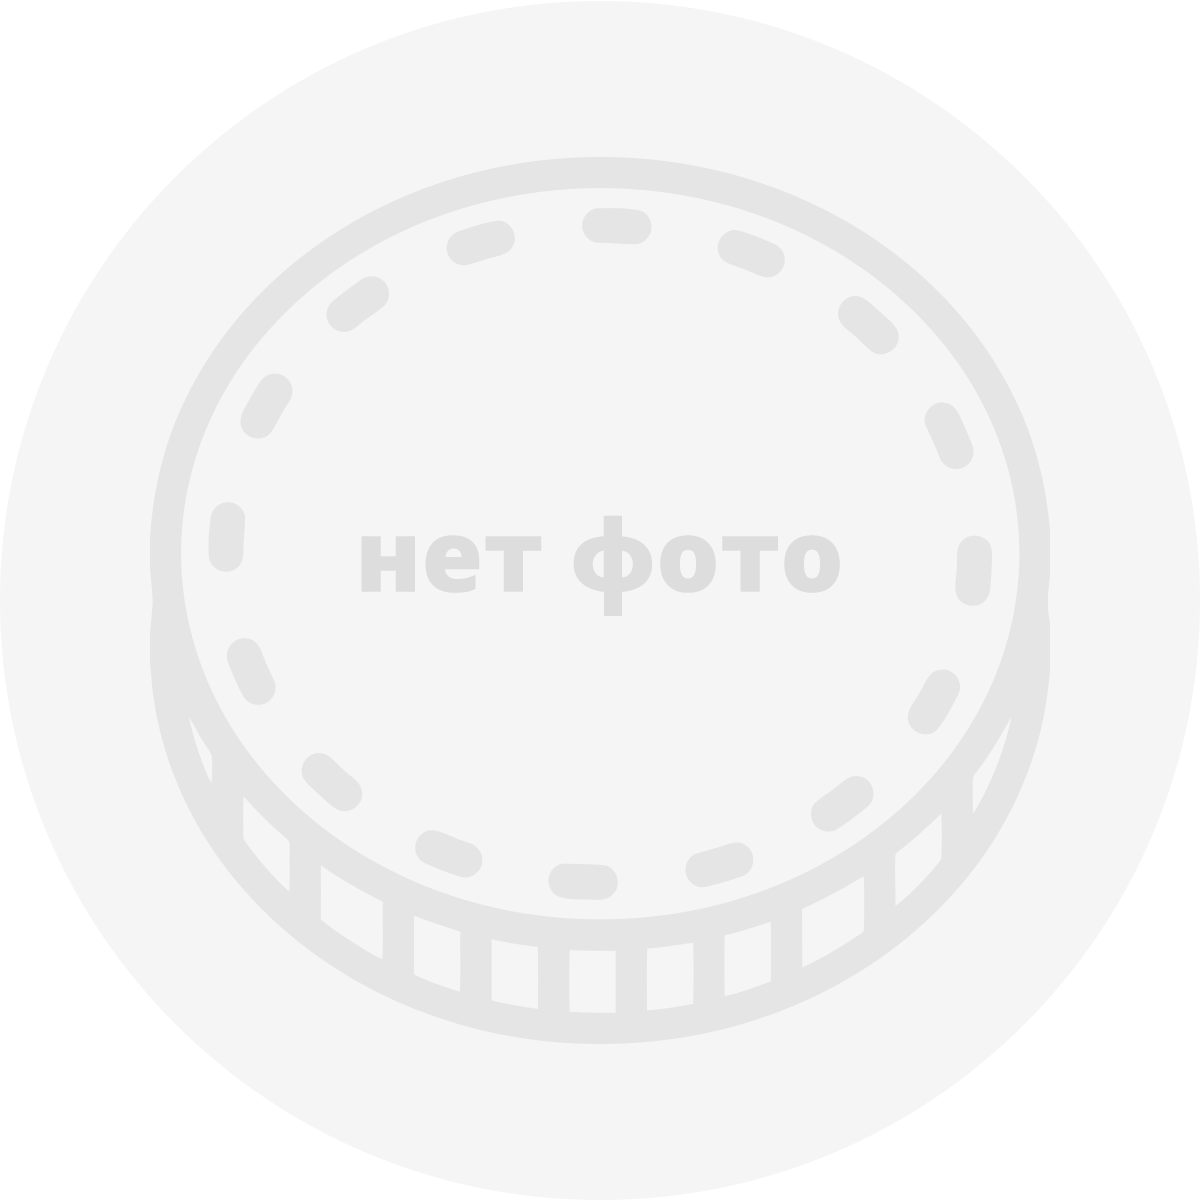 Теркс и Кайкос, 5 крон (1992 г.)